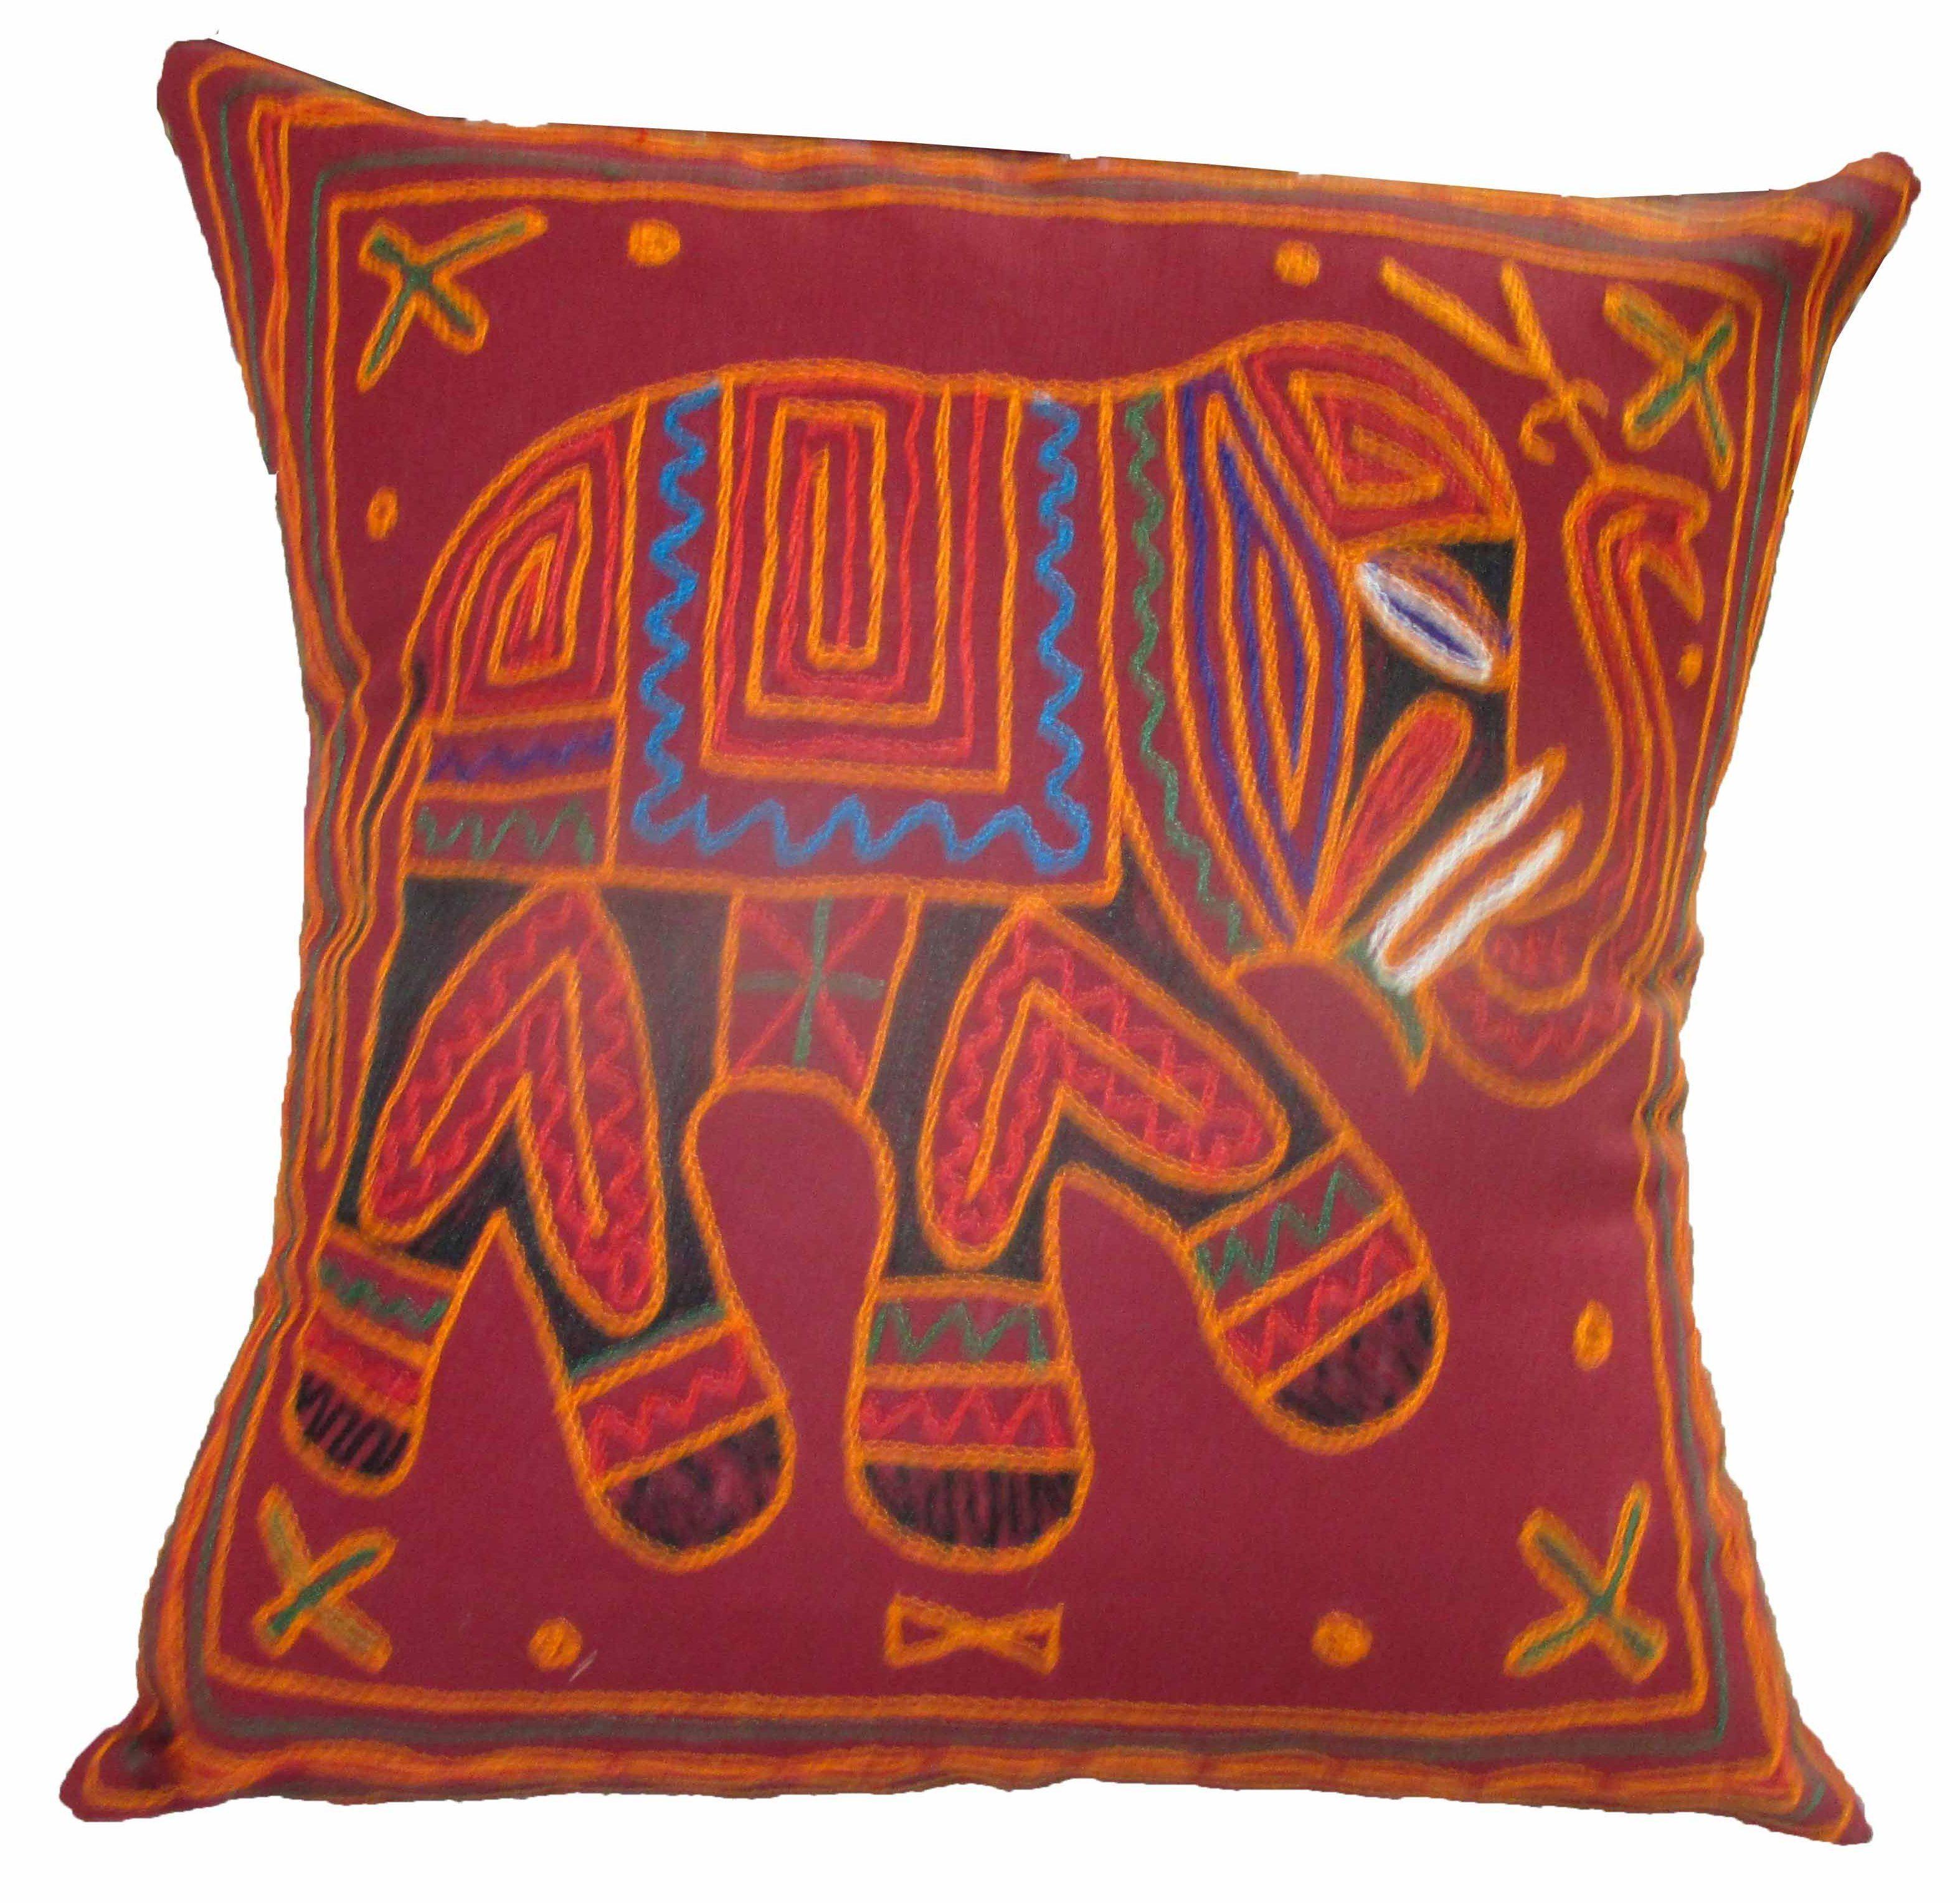 Ari Work Cushion Cover